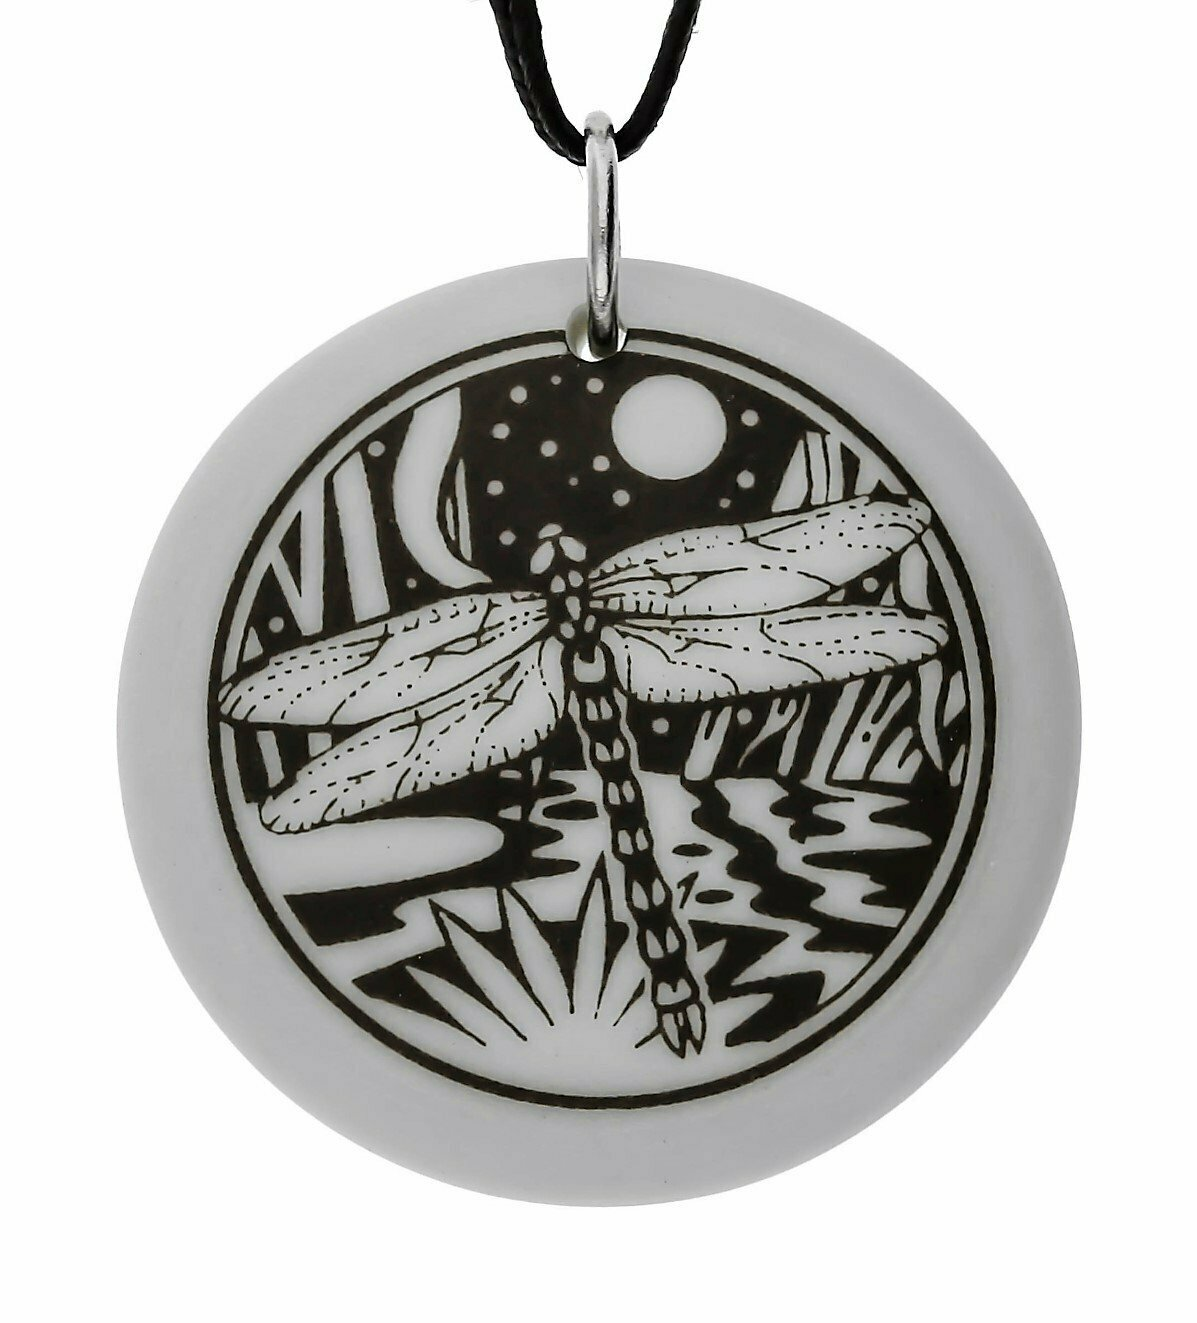 Dragonfly Totem Round Handmade Porcelain Pendant